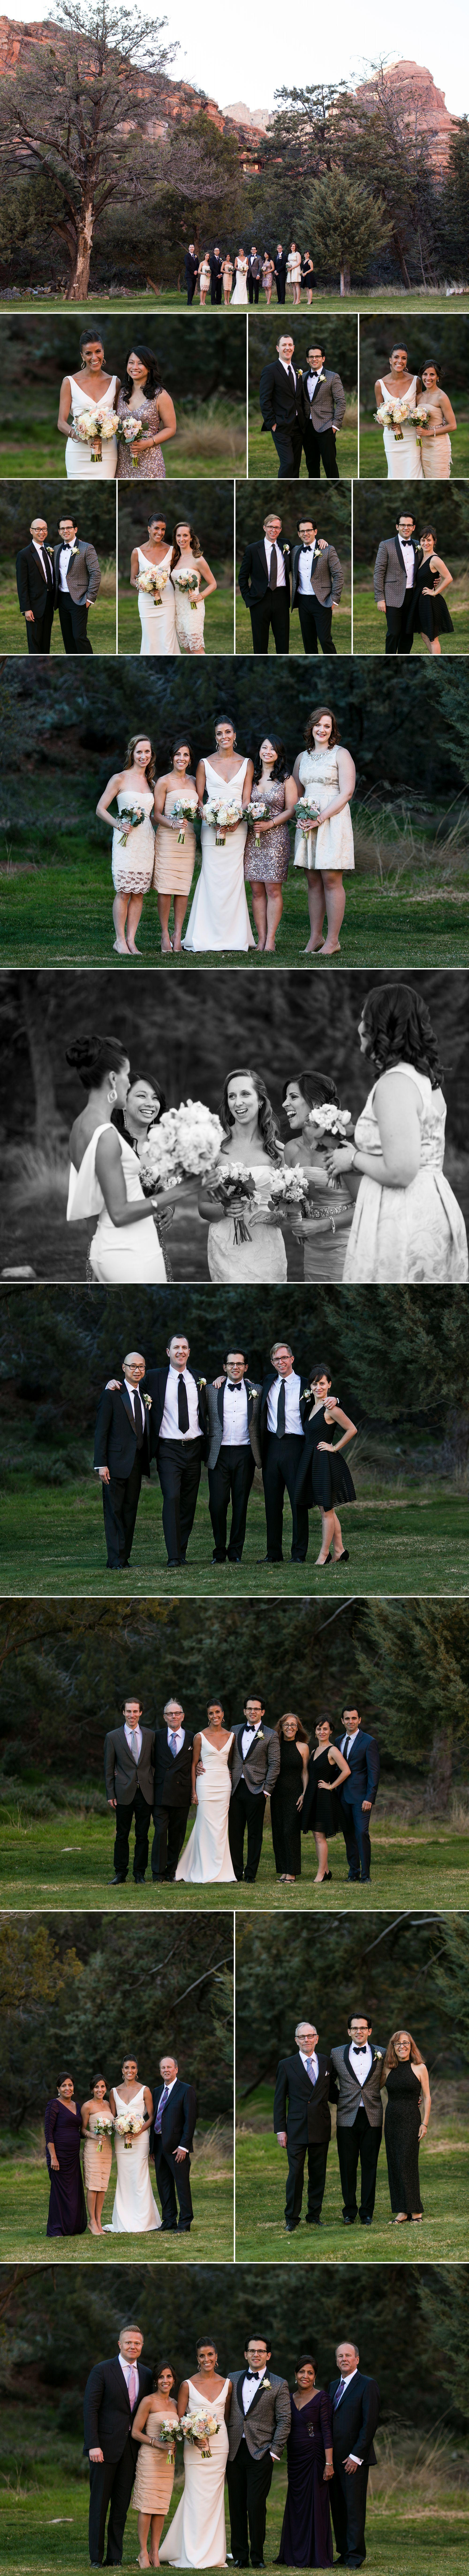 Outdoor wedding party photographs